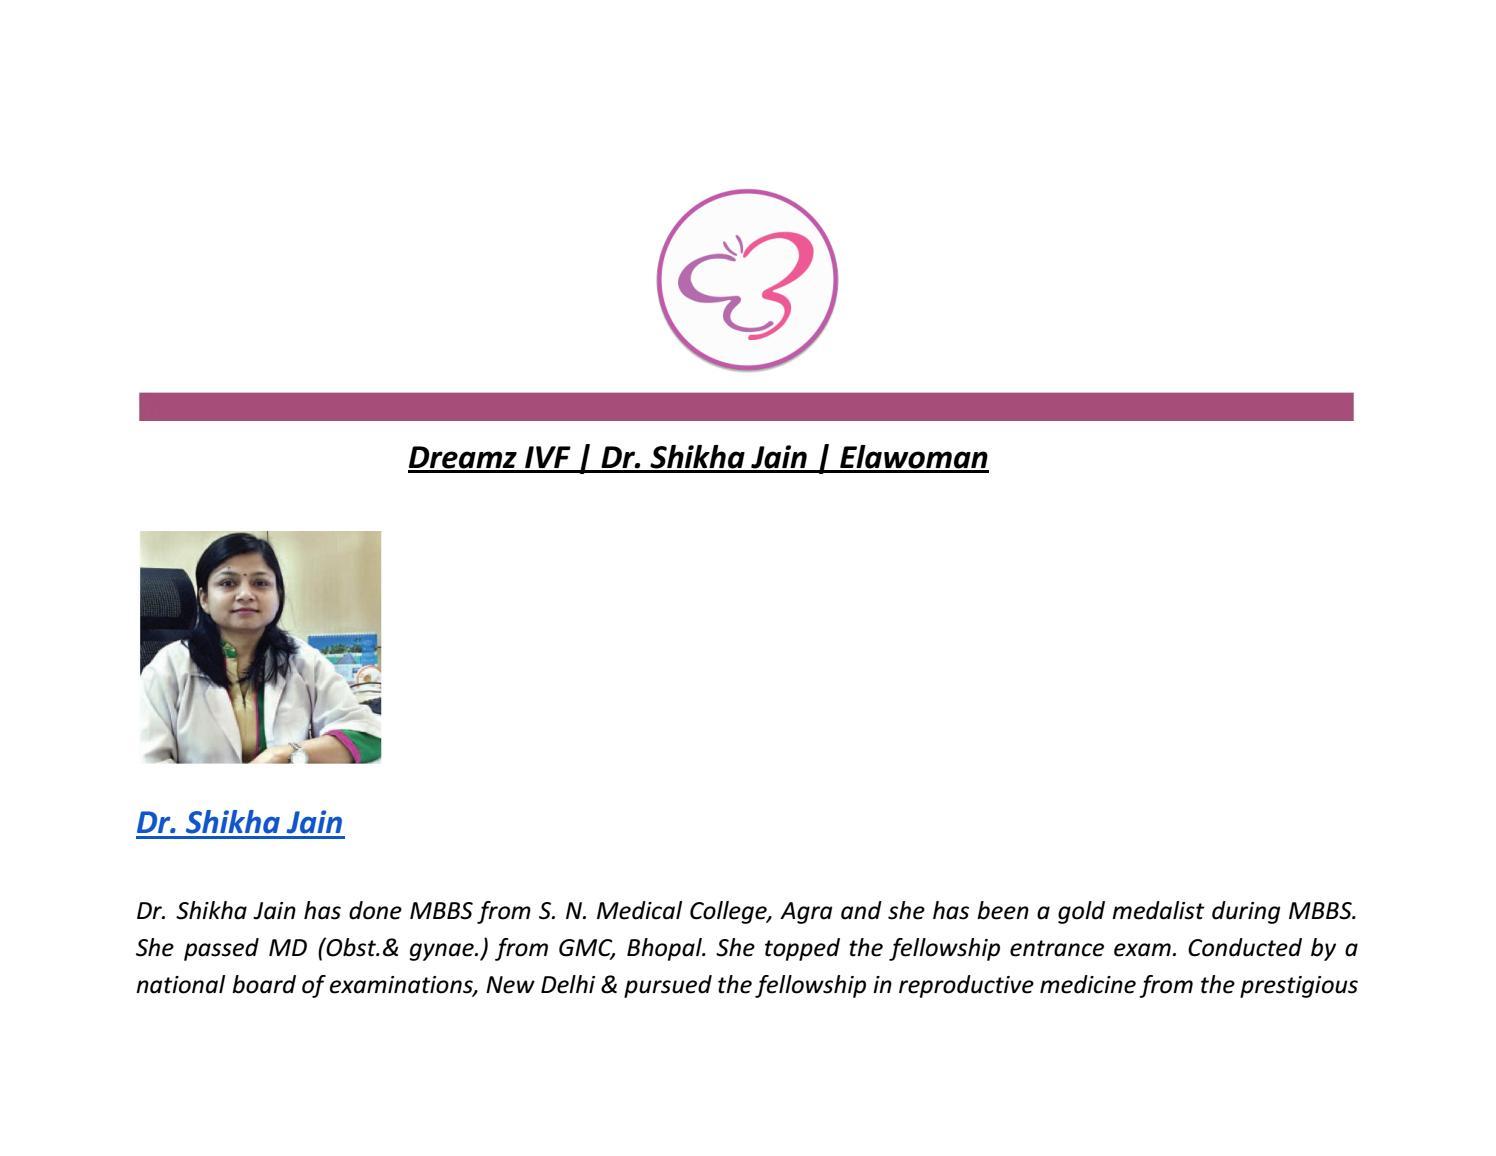 Dreamz IVF | Dr  Shikha Jain | Elawoman by URVASHI Raghu - issuu